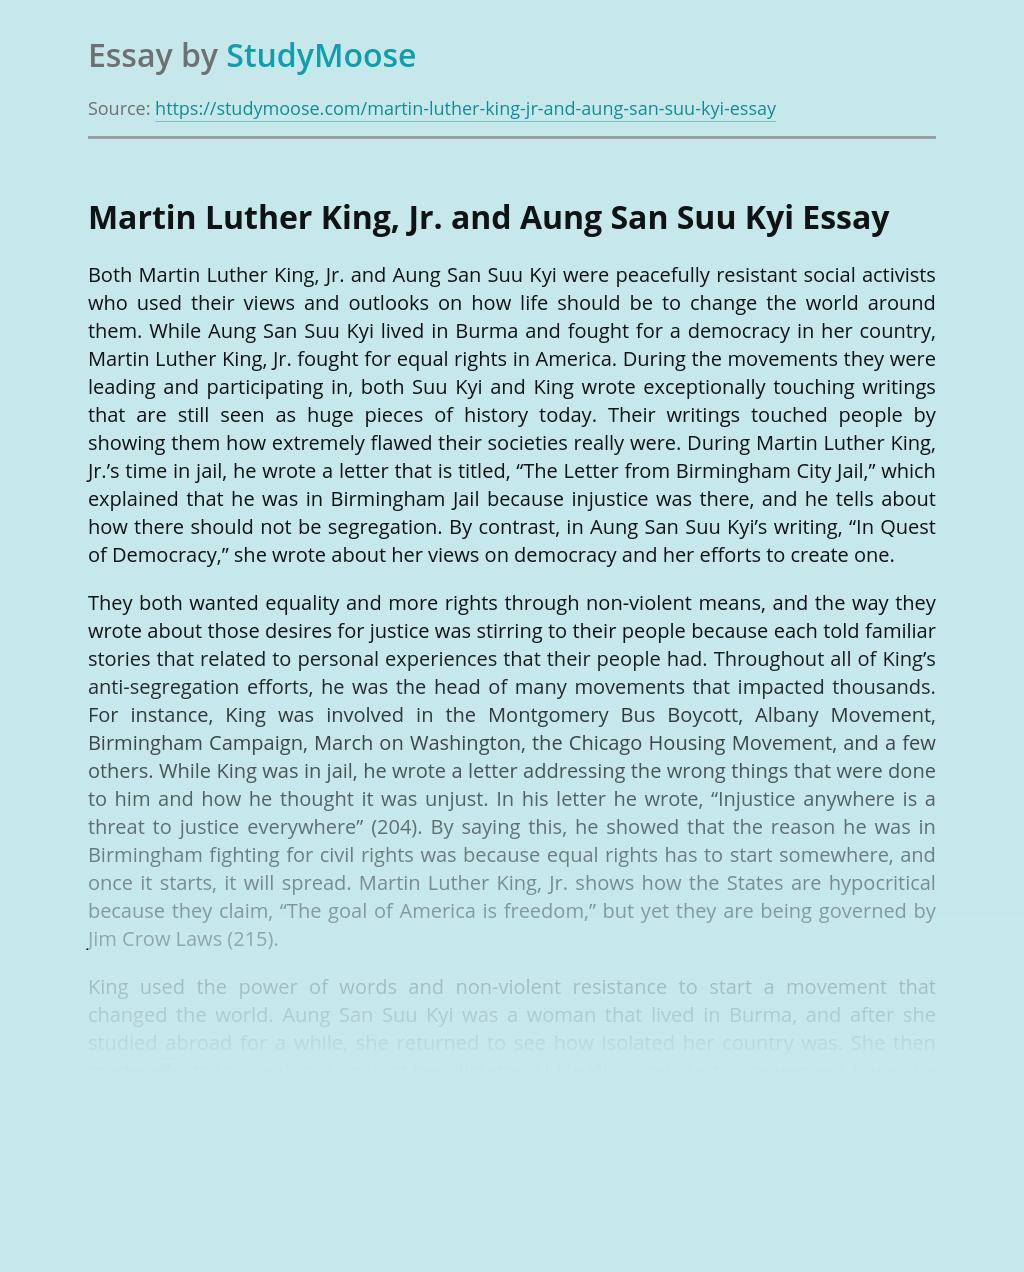 Martin Luther King, Jr. and Aung San Suu Kyi